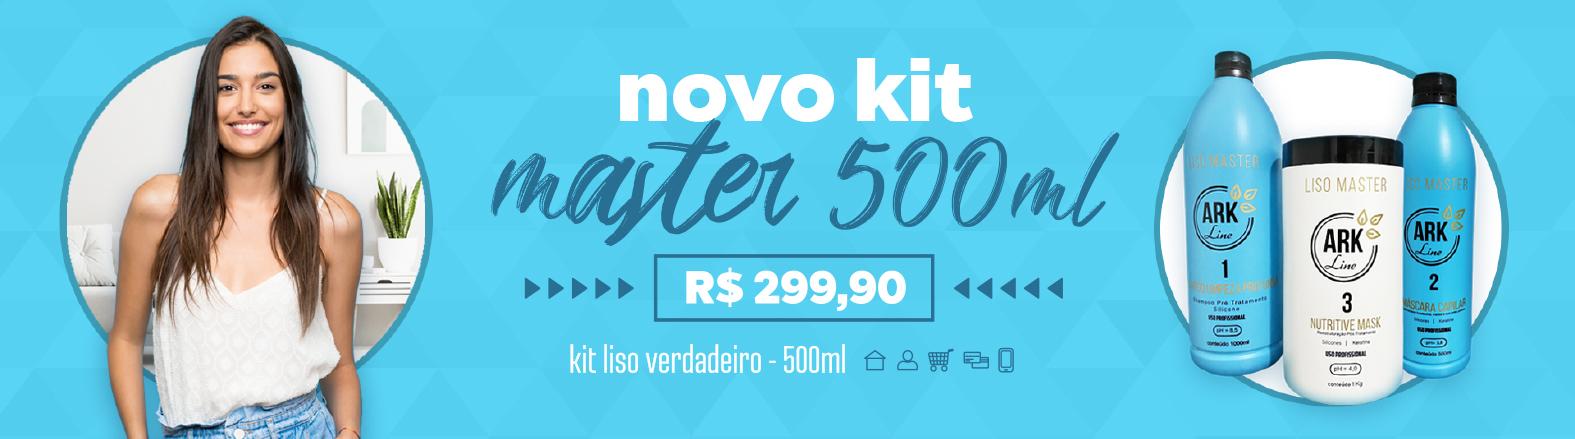 Banner_Preço_500ml_NOVO